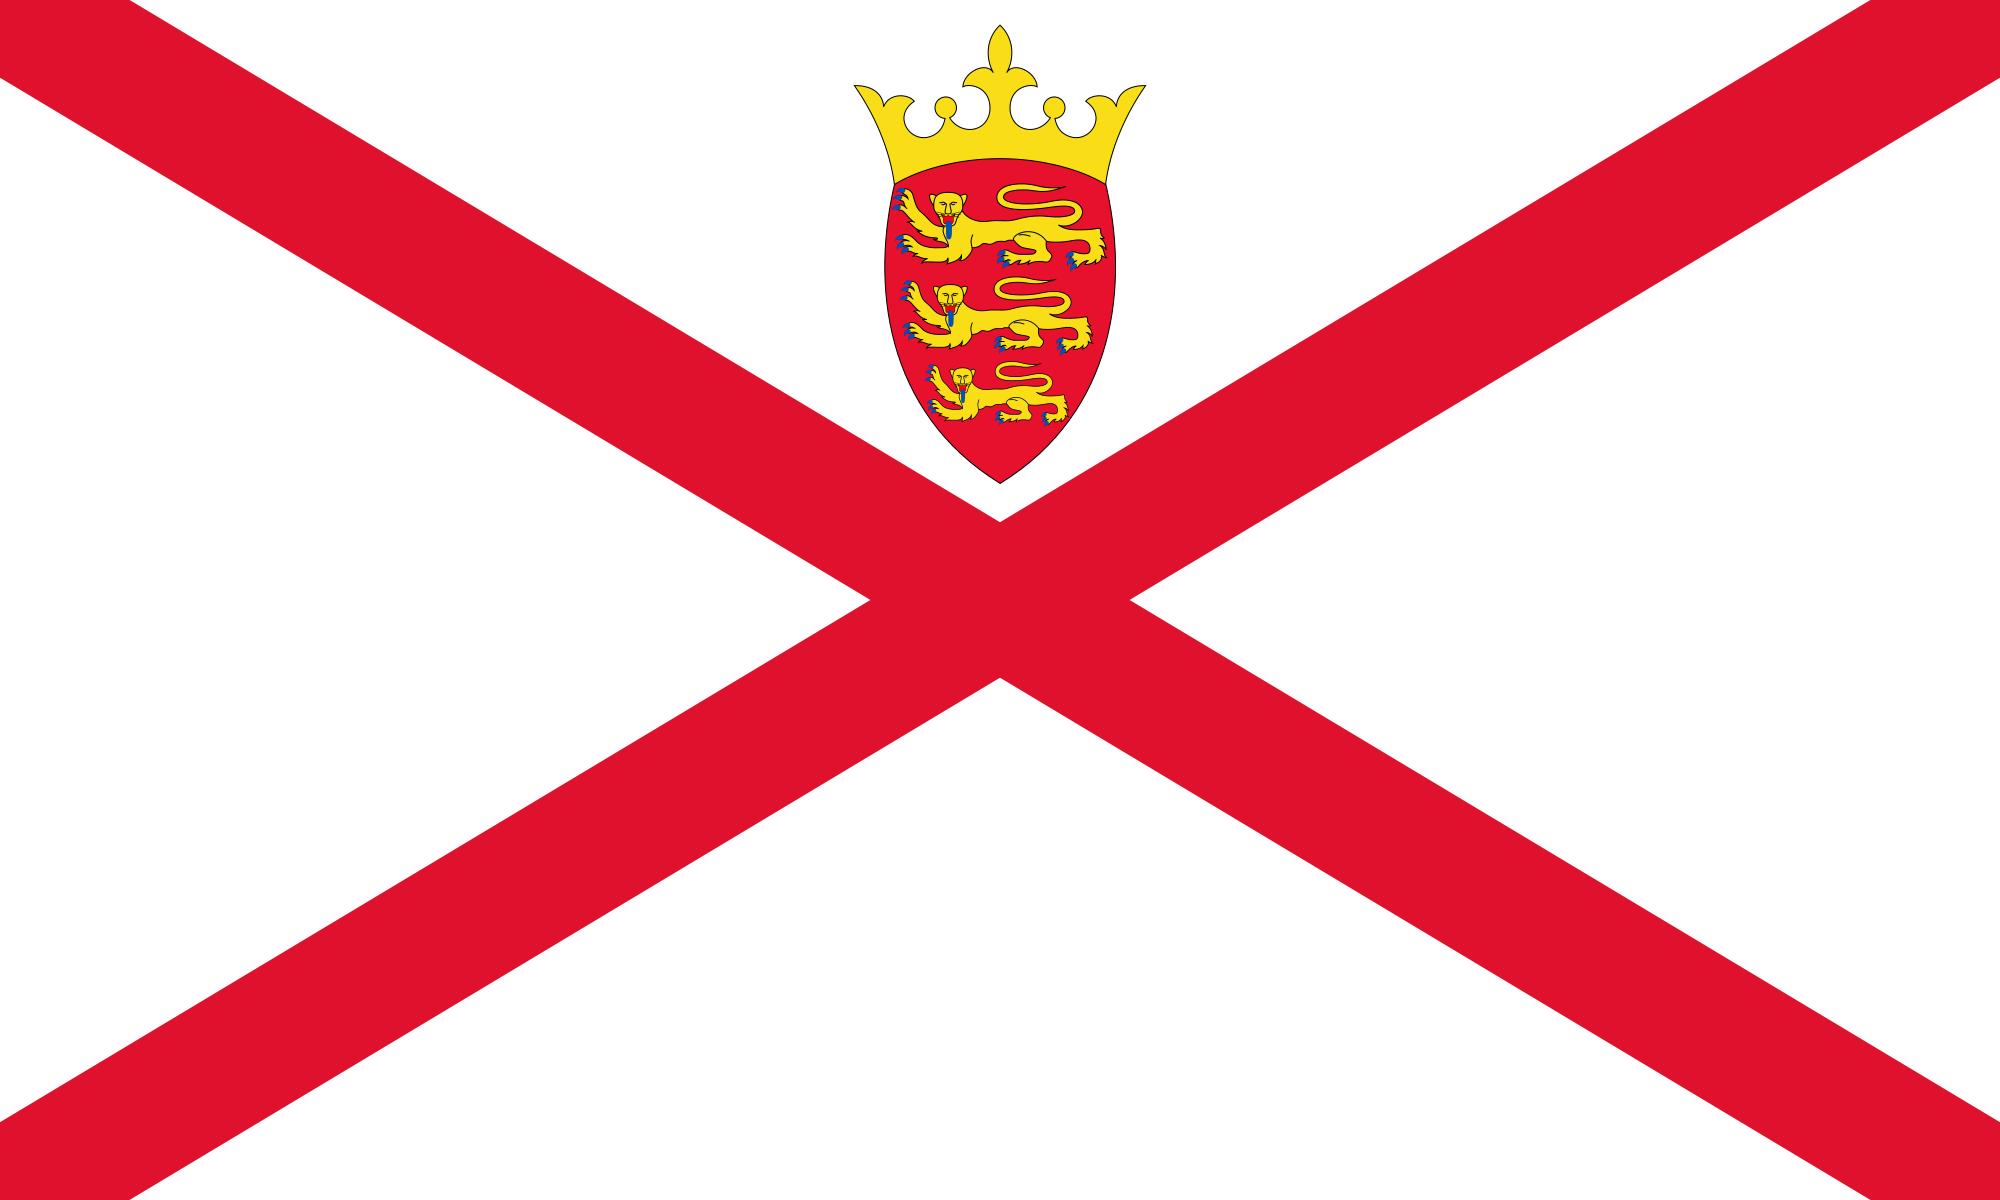 jersey, Land, Emblem, Logo, Symbol - Wallpaper HD - Prof.-falken.com